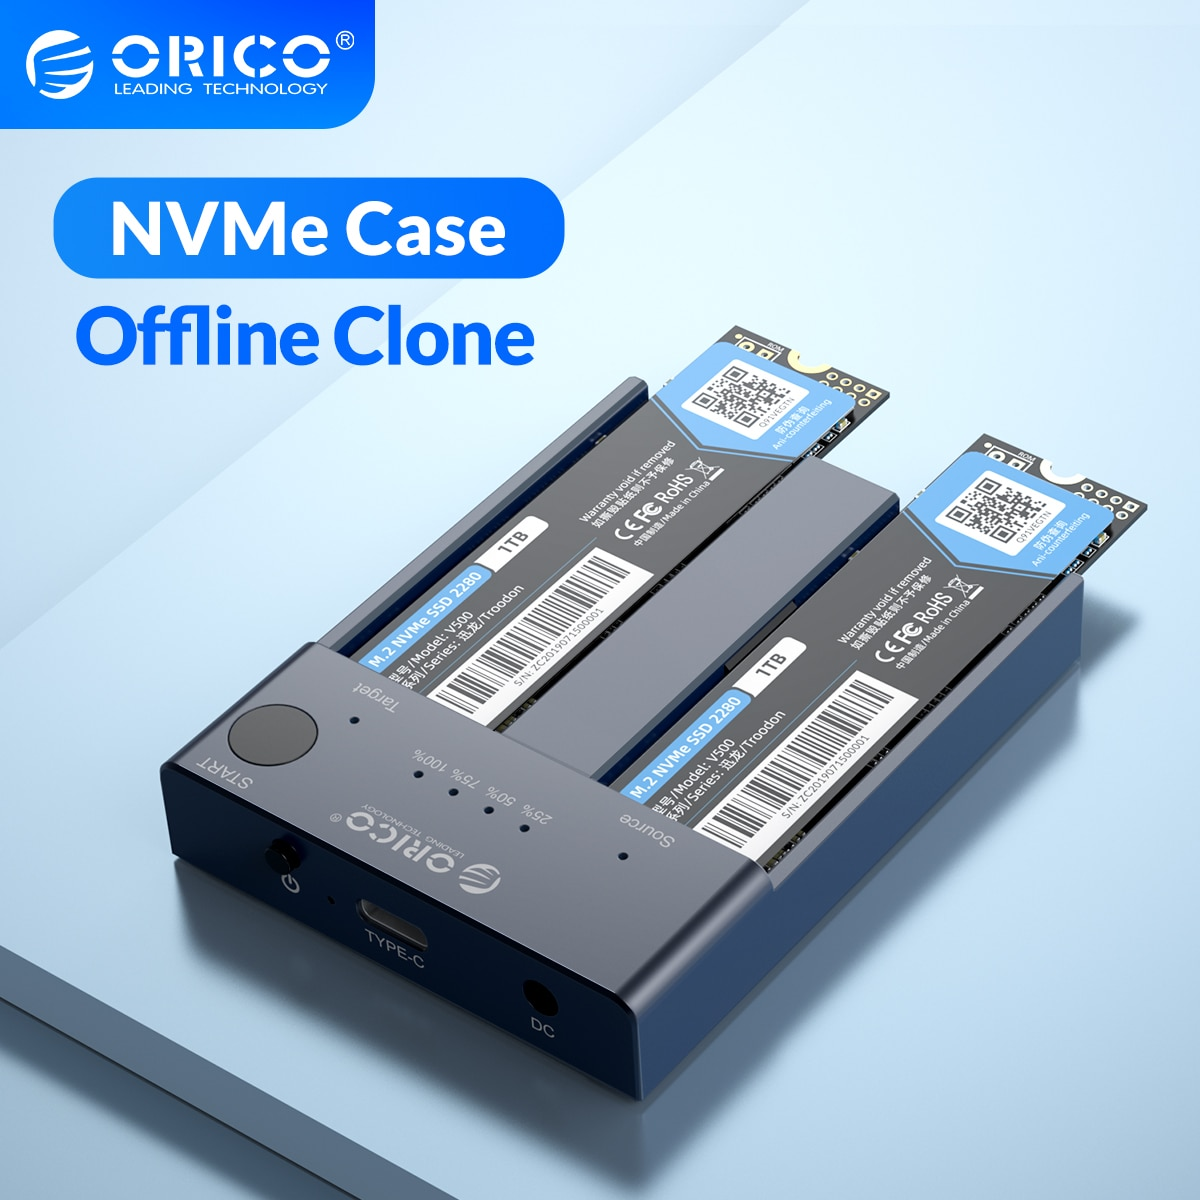 cfast card reader usb3 1 dual port usb a usb c portable gen2 10gbps cfast reader ORICO Dual Bay M.2 NVME SSD Enclosure 10Gbps Offline Clone USB C 3.1 Gen2 For M Key M/B Key NVME PCIe SSD Hard Drive Reader 4TB